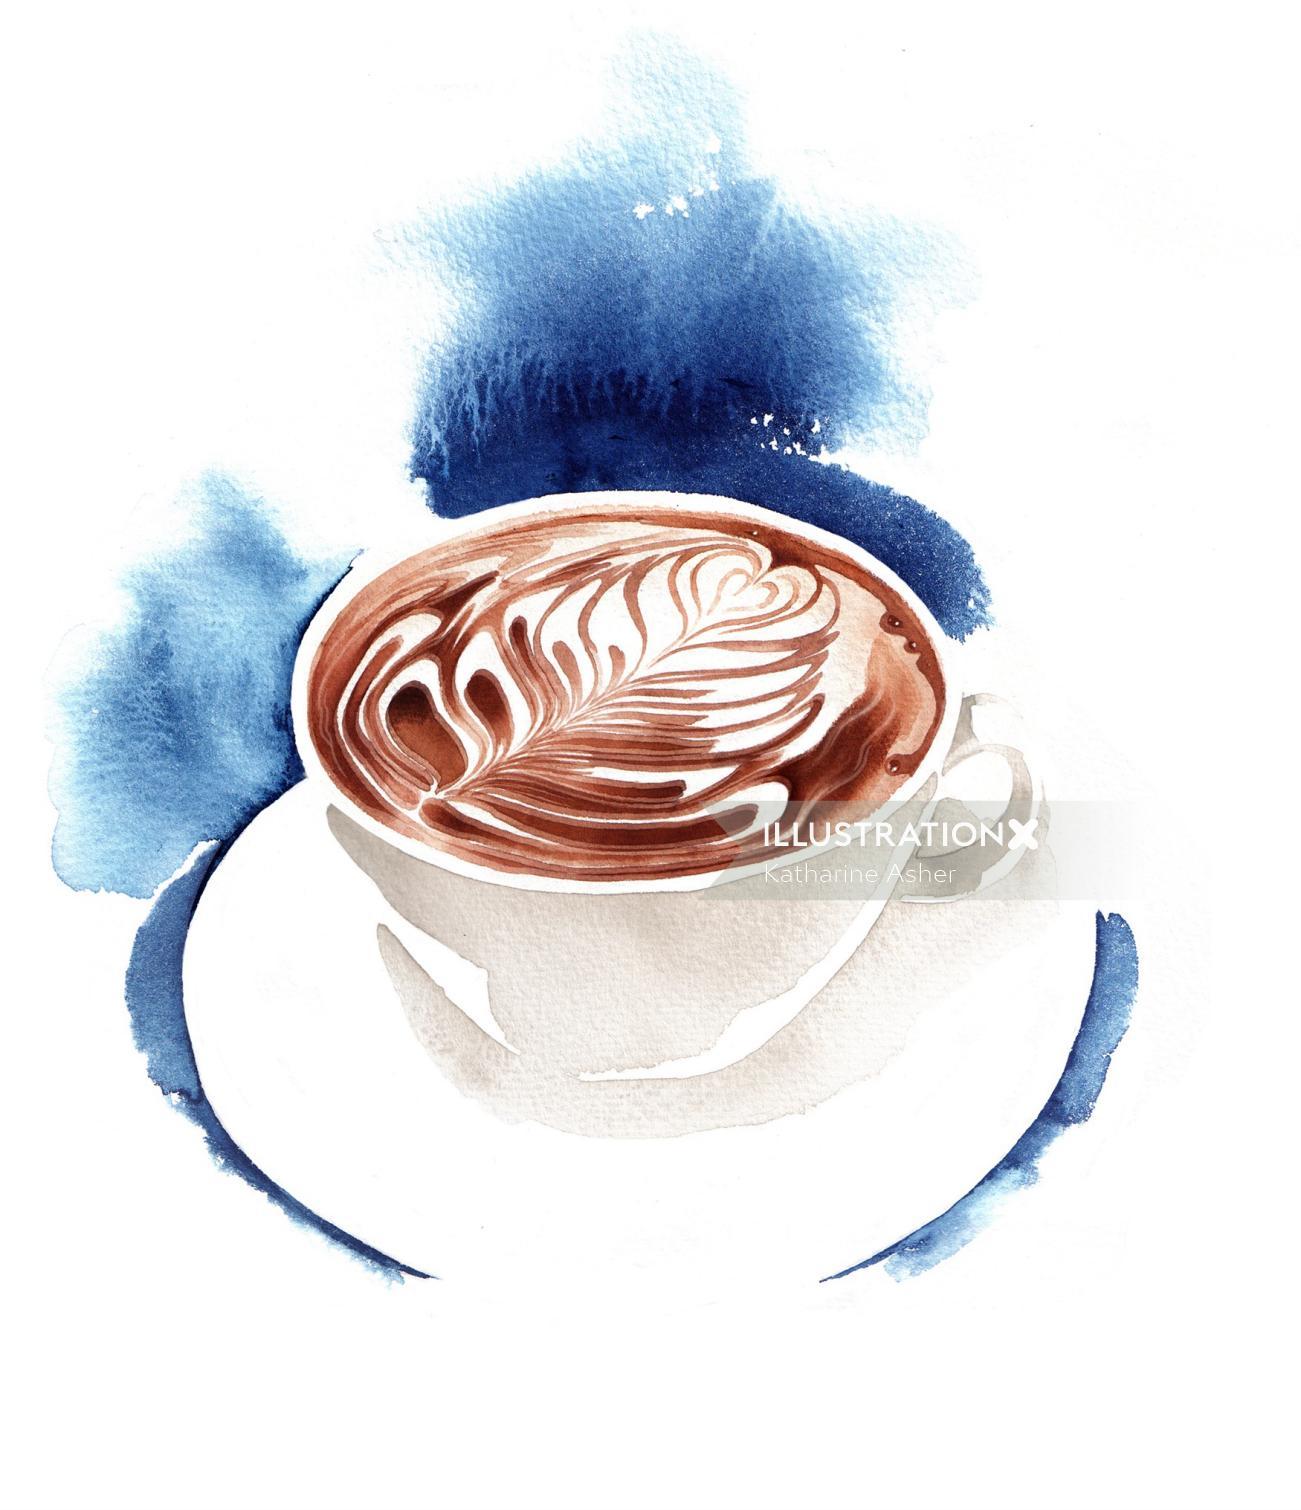 Finest Coffee illustration